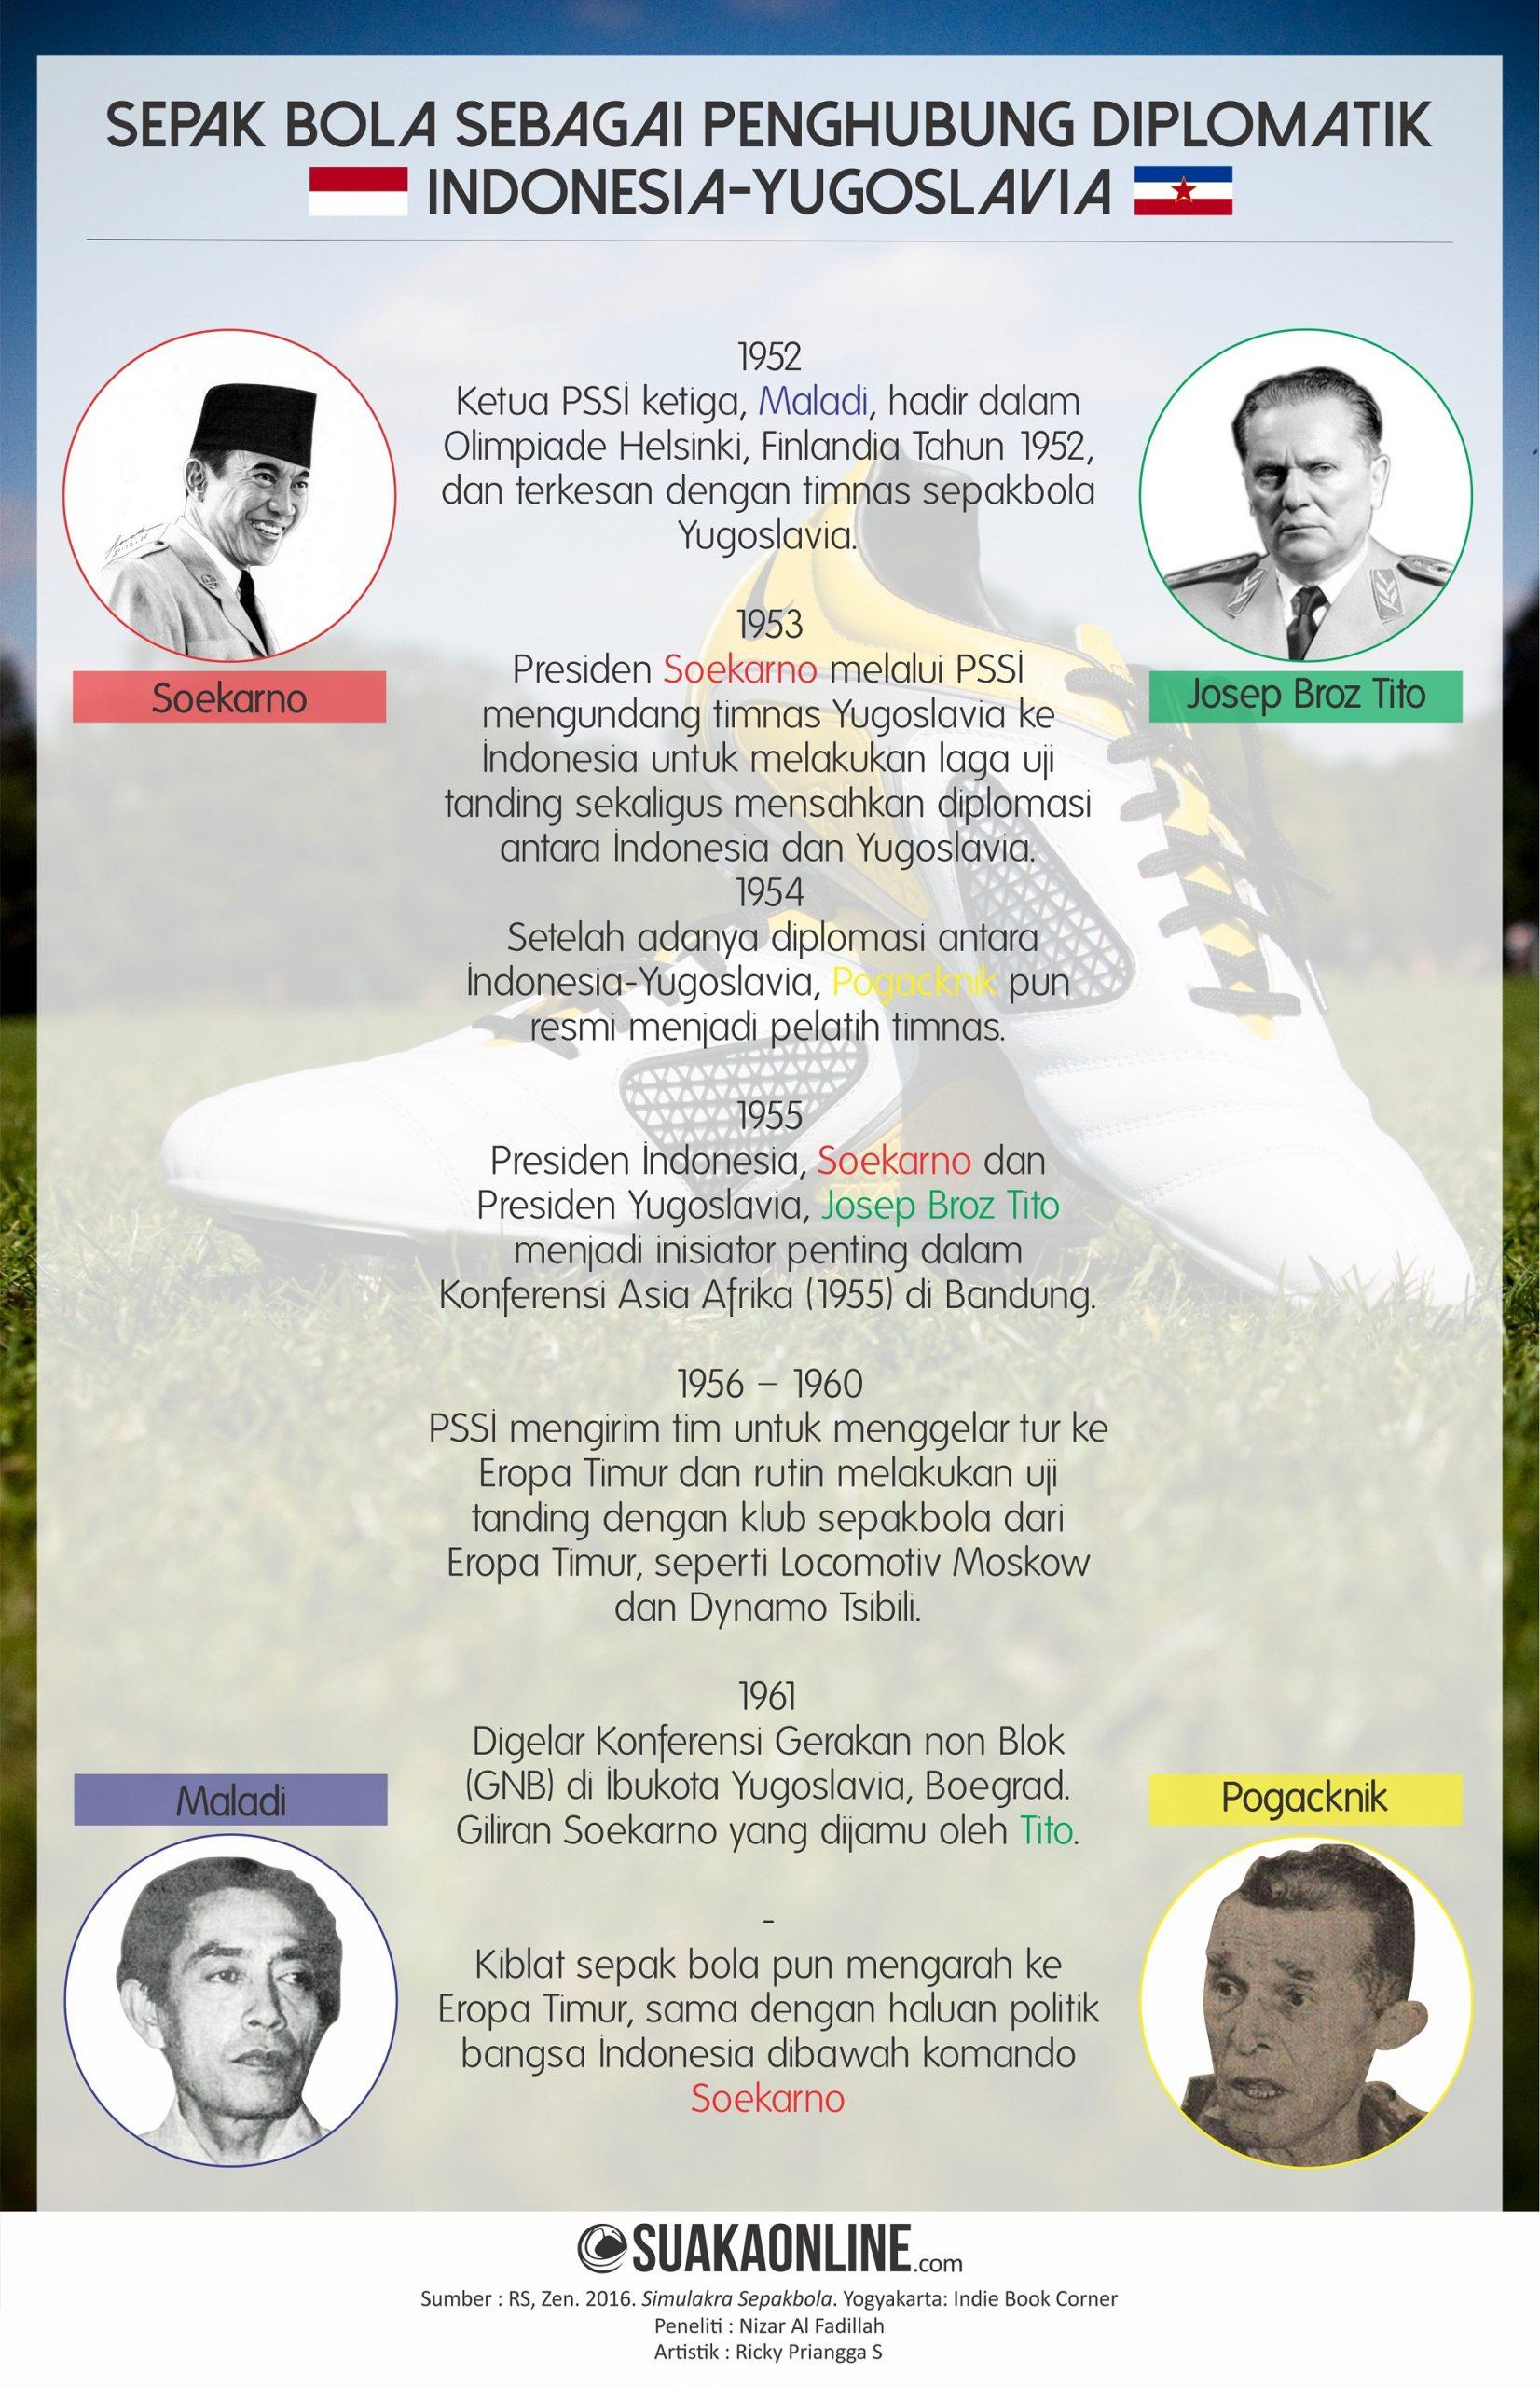 Desain : SUAKA / Ricky Priangga S.